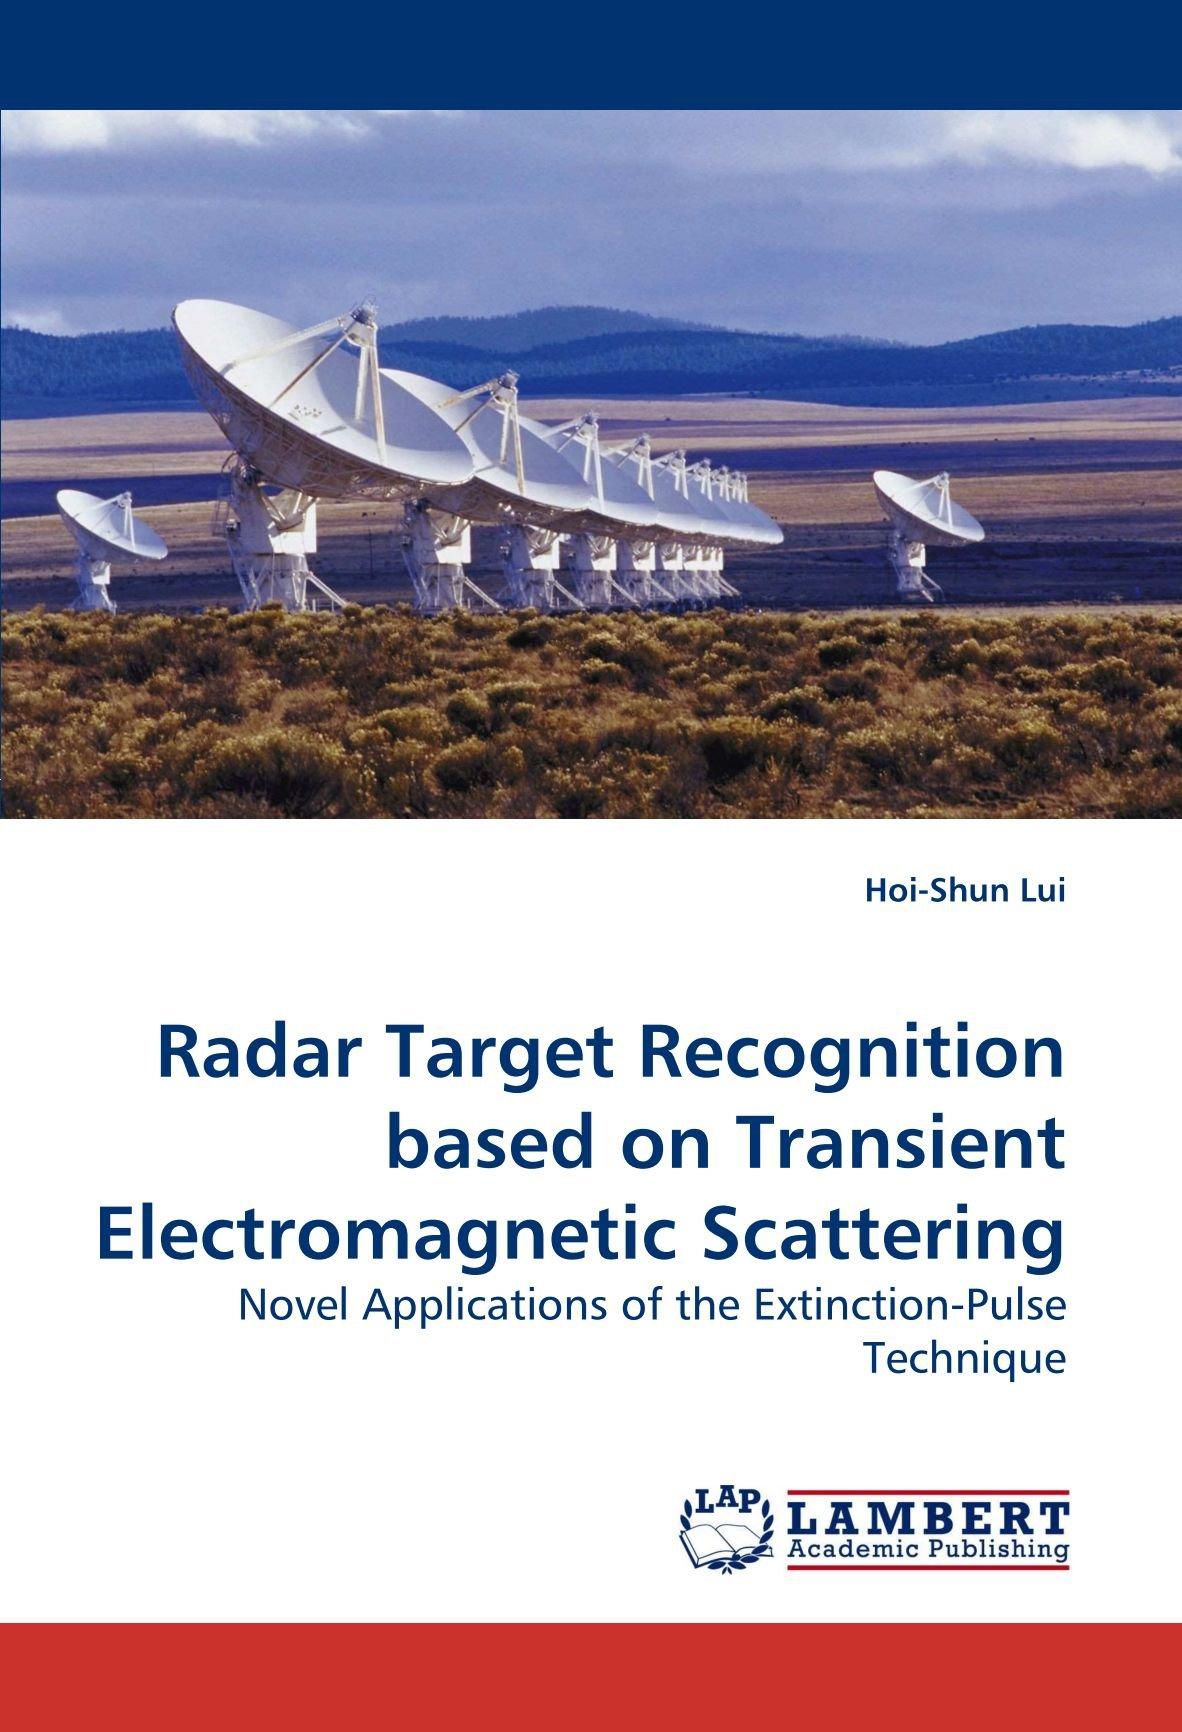 Lui, H: Radar Target Recognition based on Transient Electrom ...